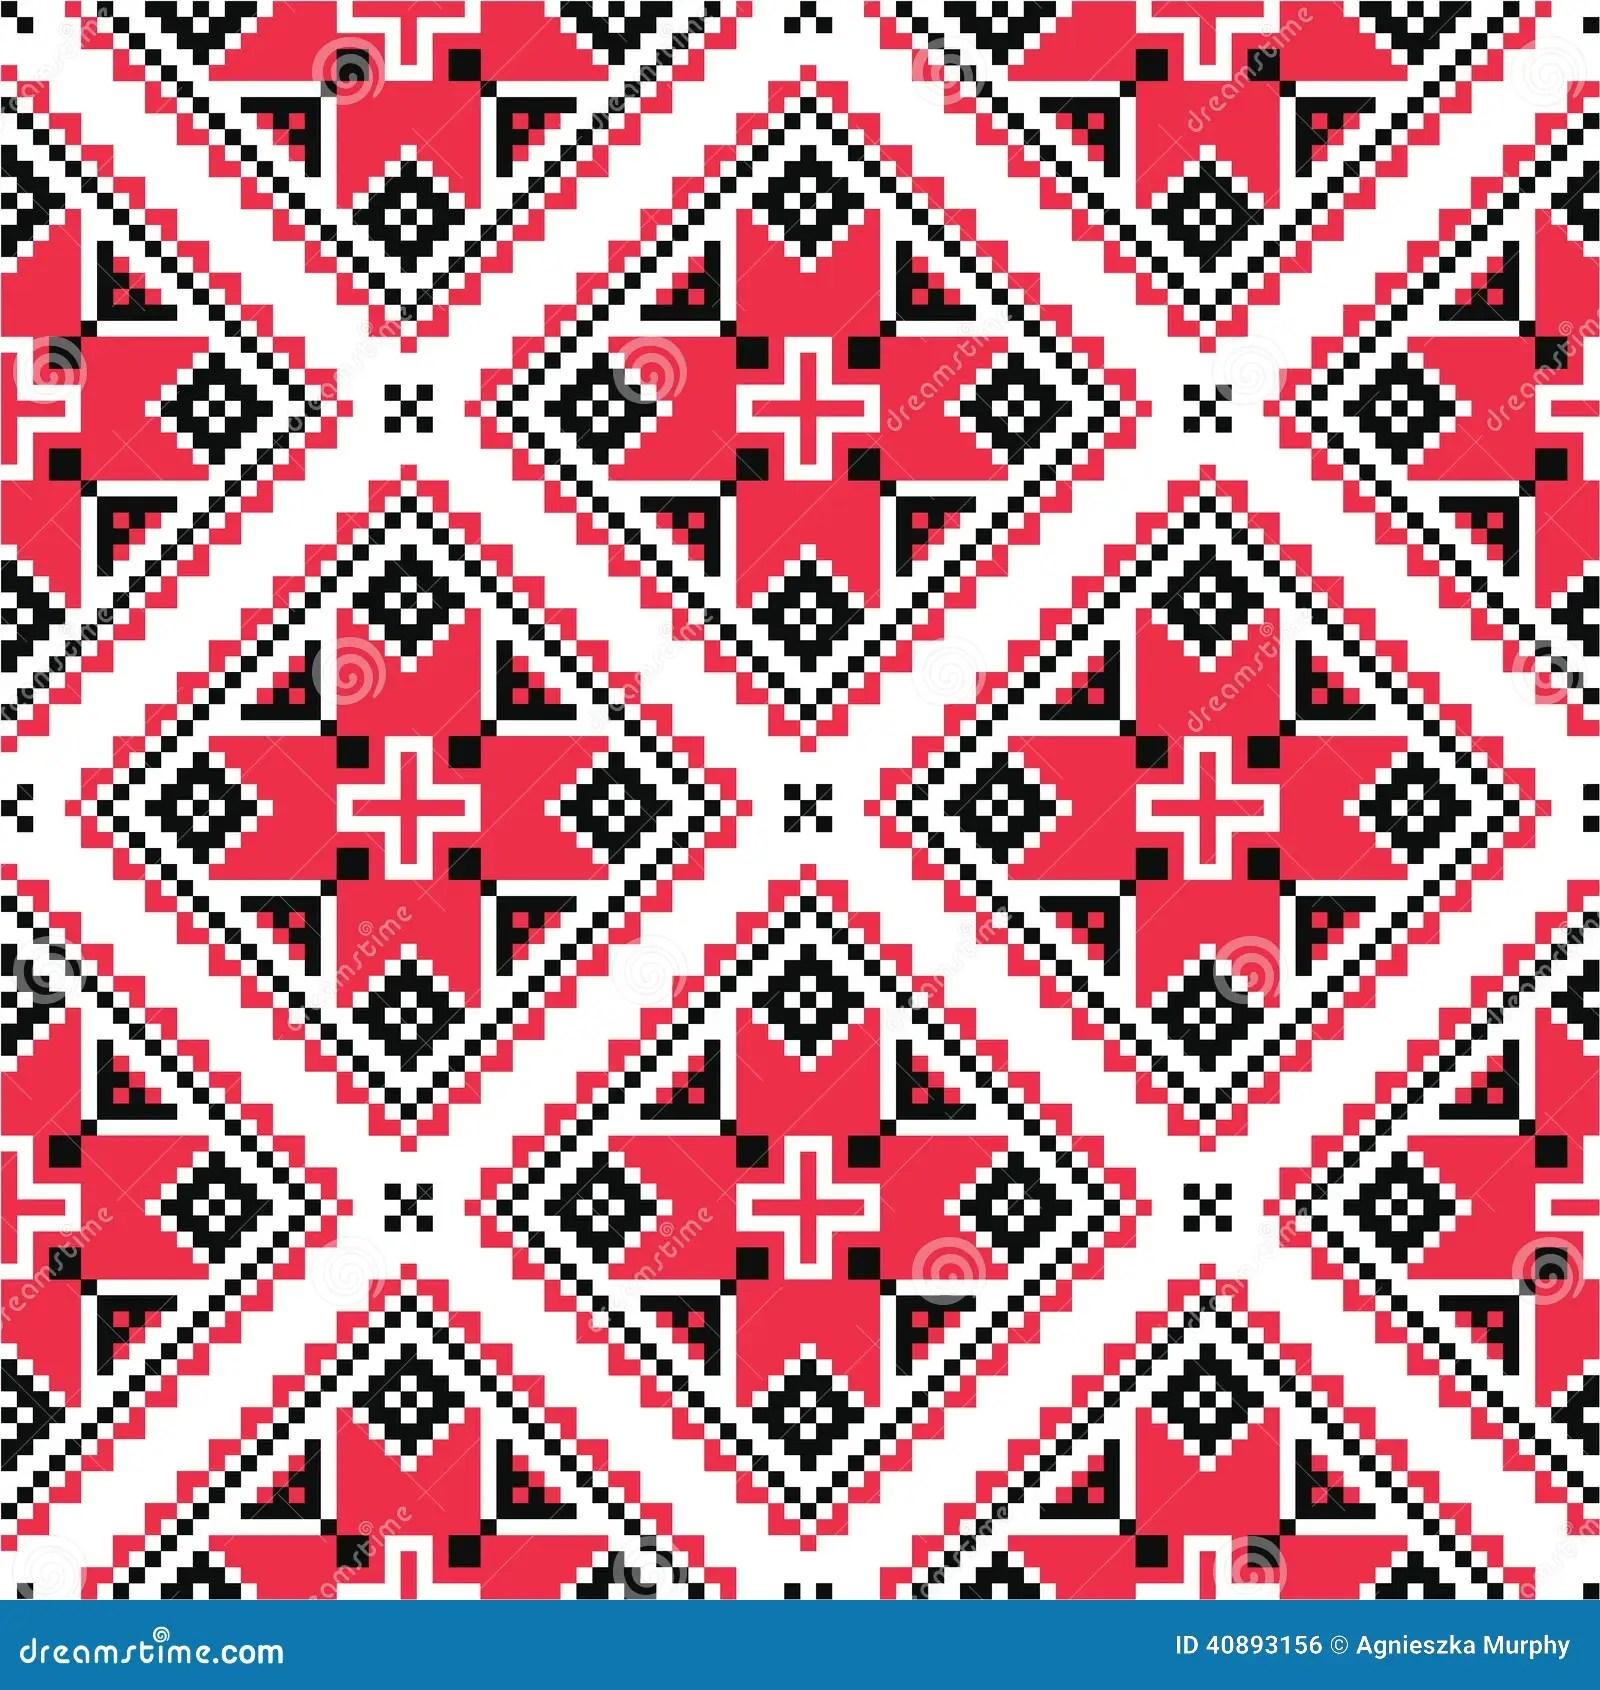 Tribal Pattern Wallpaper Hd Ukrainian Traditional Folk Knitted Red Embroidery Pattern